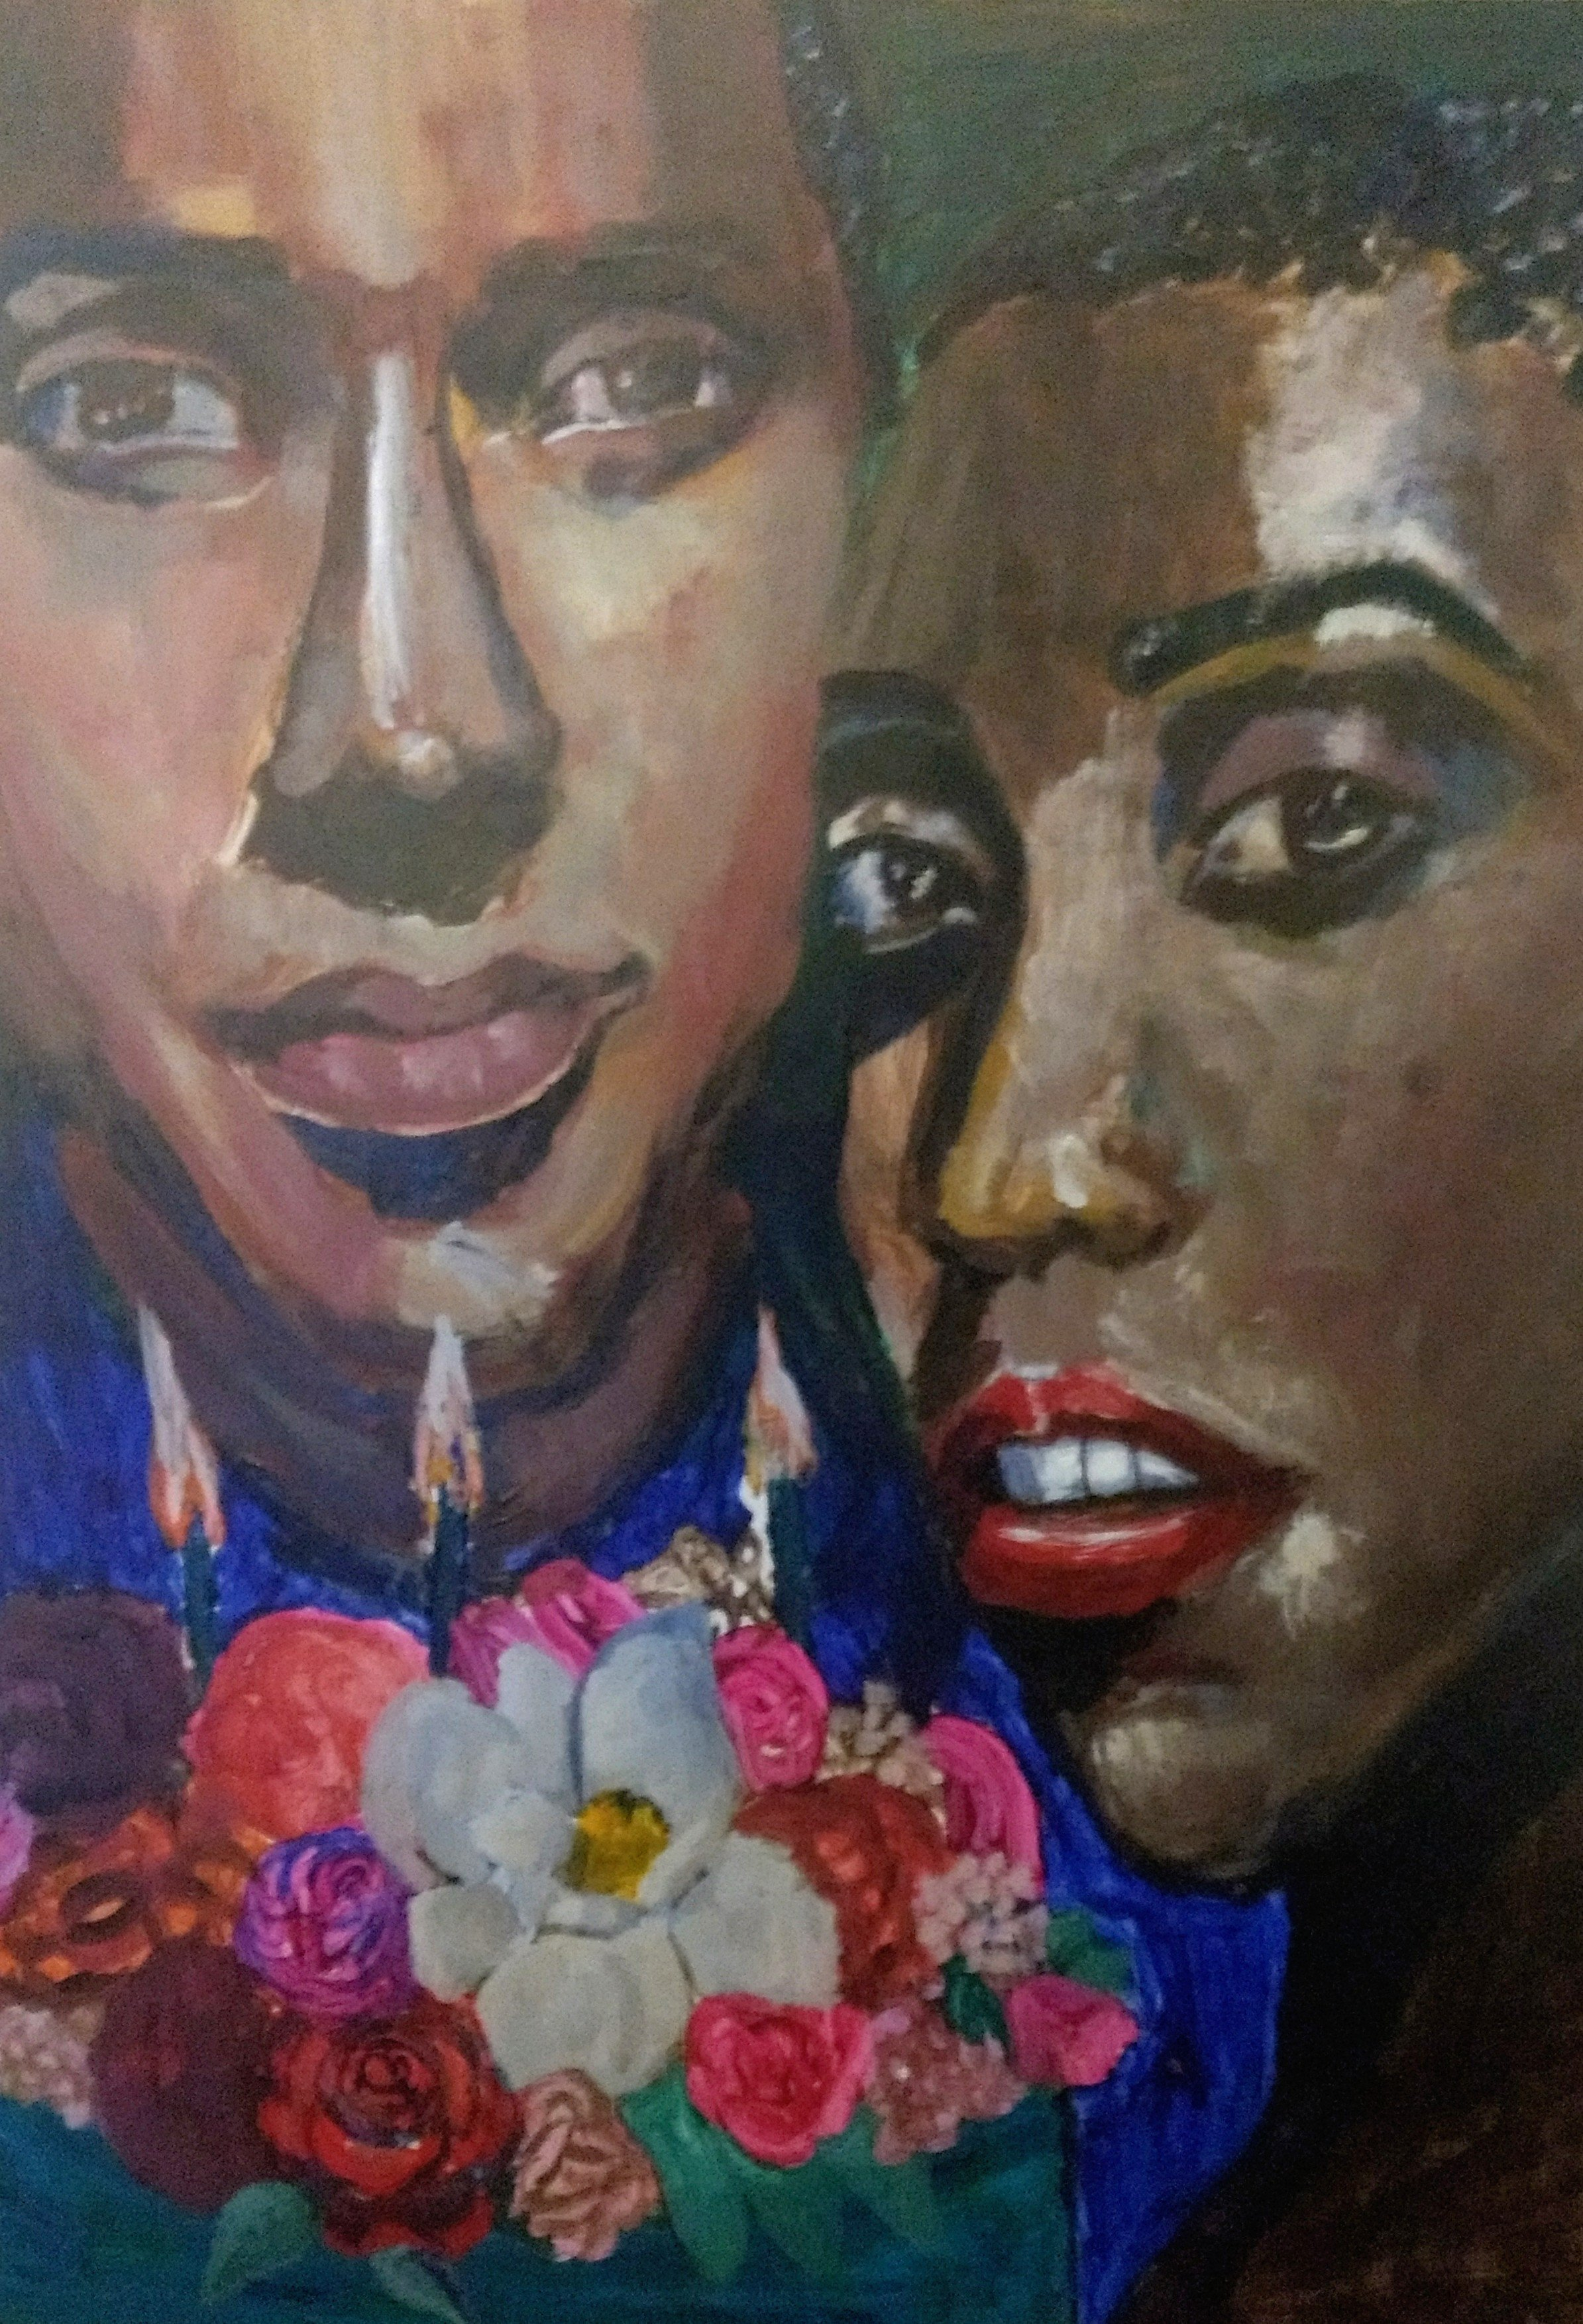 Flowers On His Cake , acrylic on wood panel, 2019 by Janyce Denise Glasper